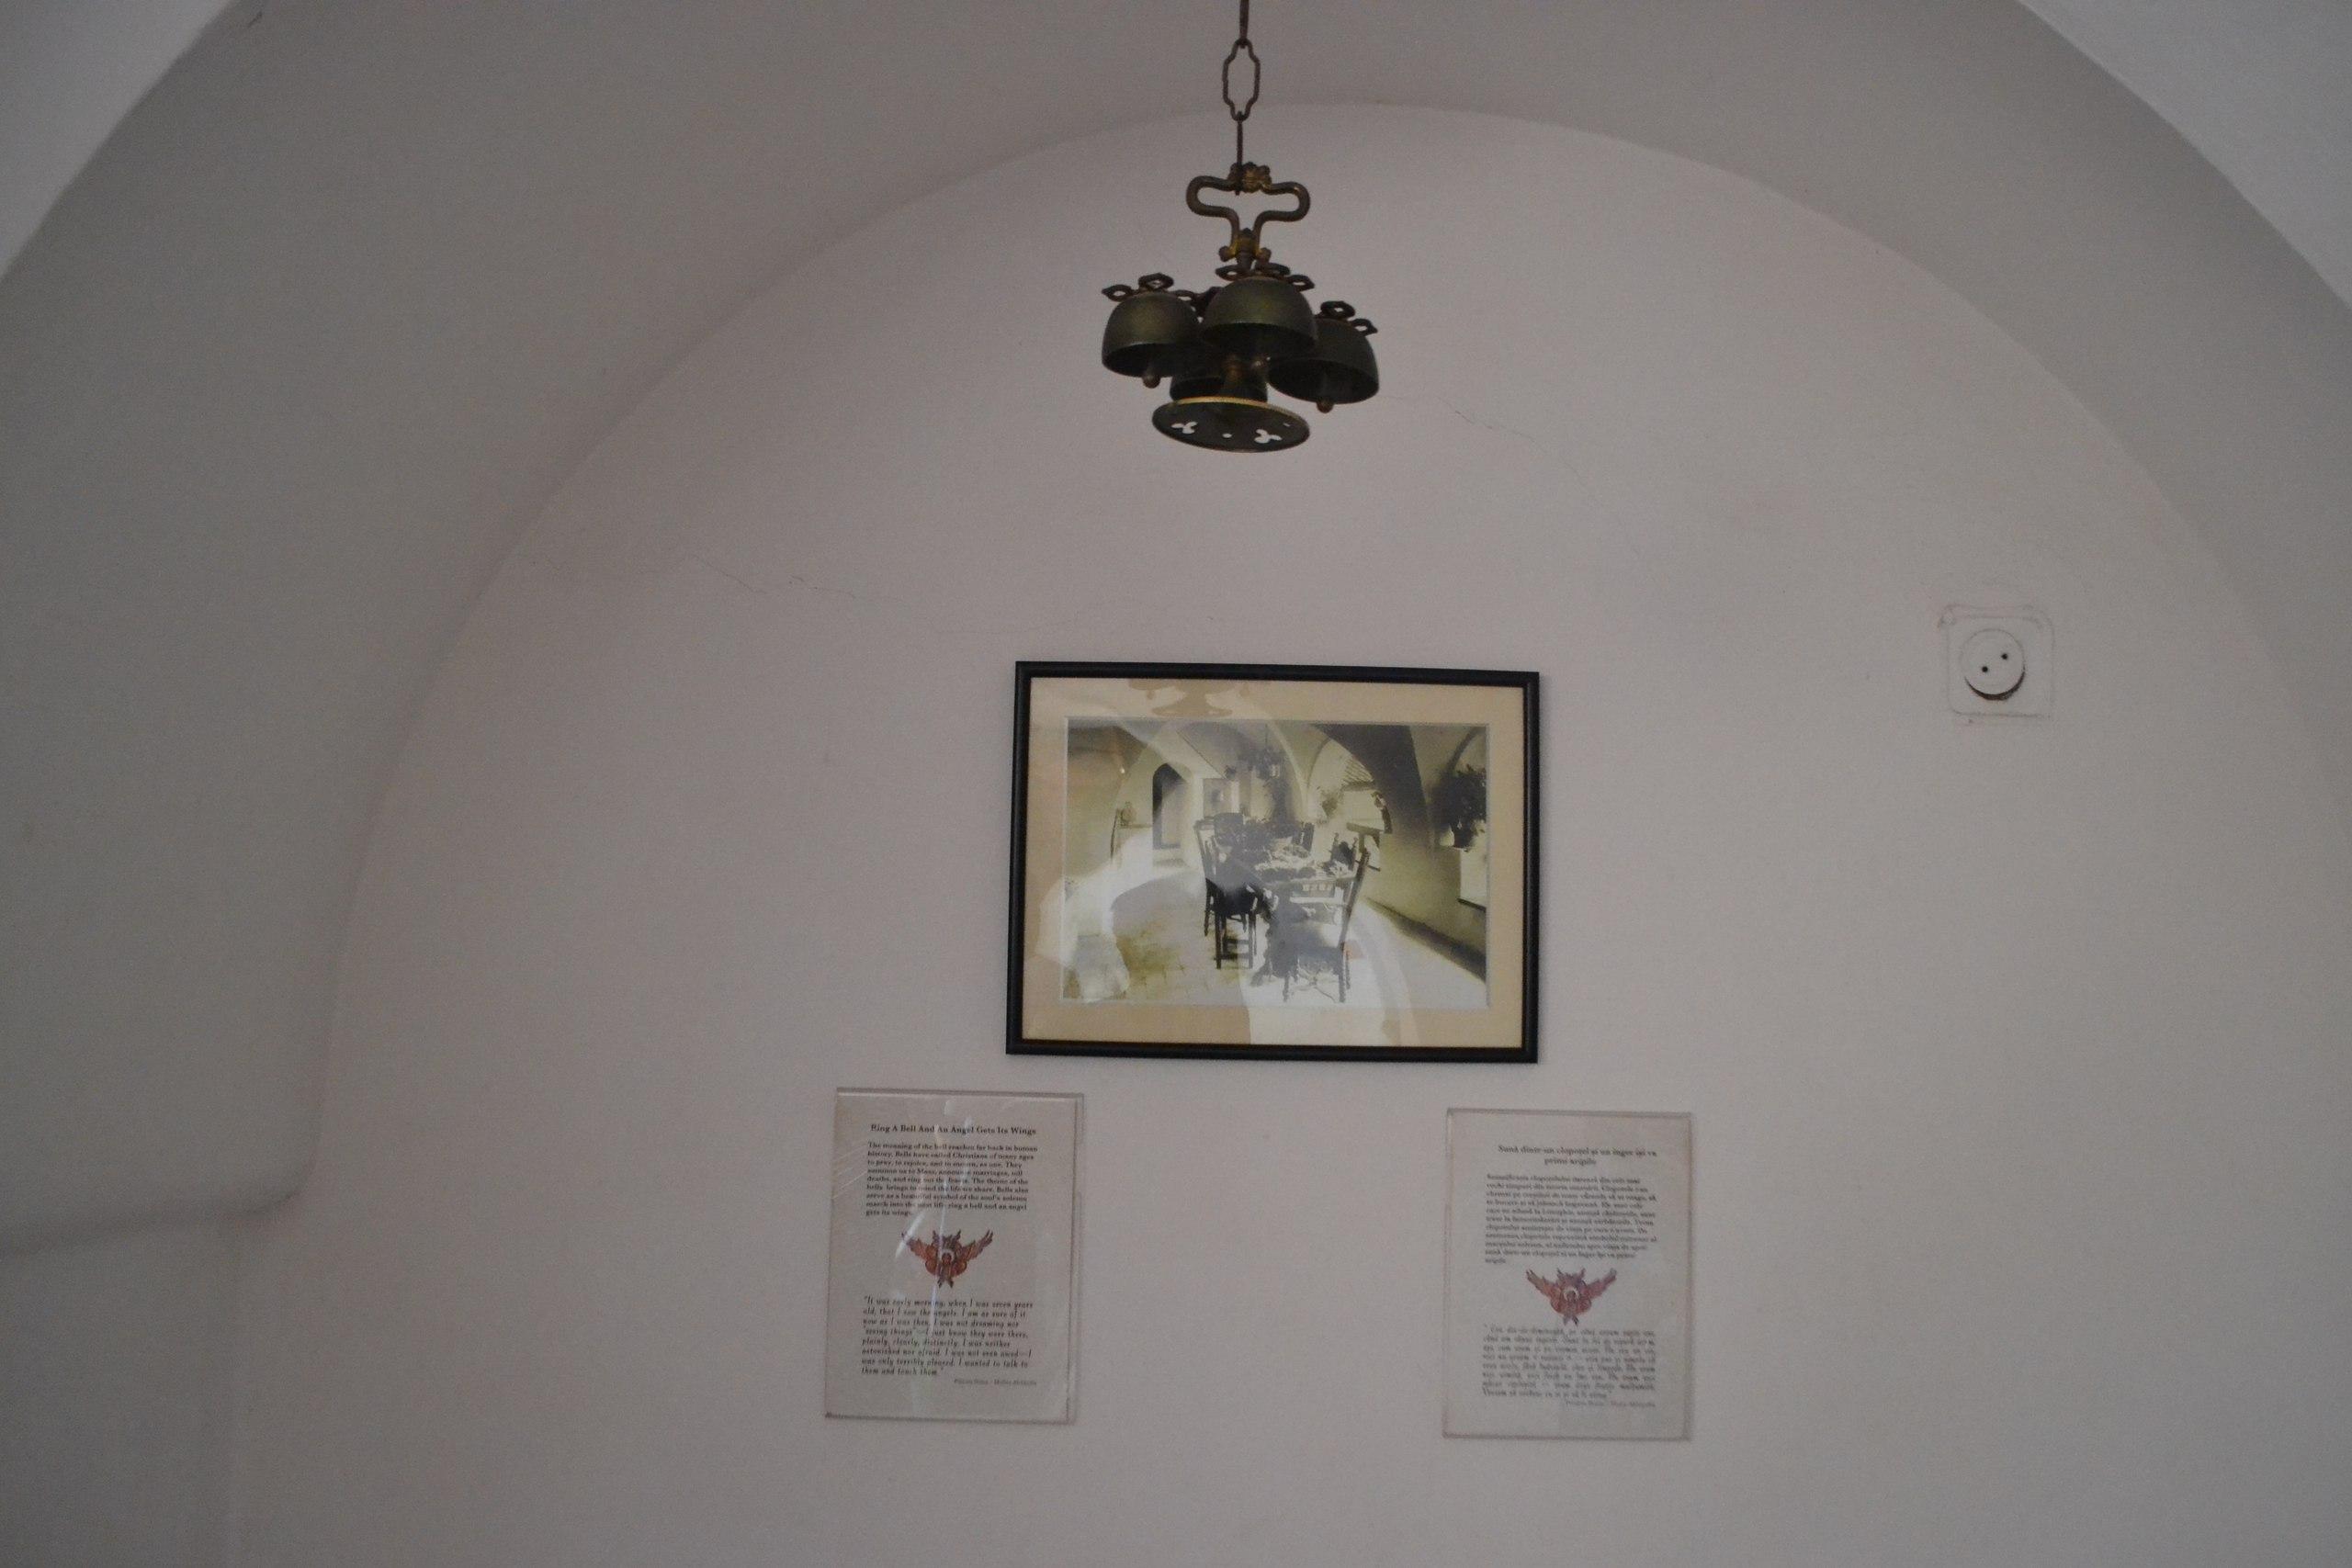 Елена Руденко (Валтея). Румыния. Август 2017 г. Трансильвания. Замок Бран (Замок Дракулы), Замок Пелеш, Бухарест. - Страница 9 VwcC2IpyB7U